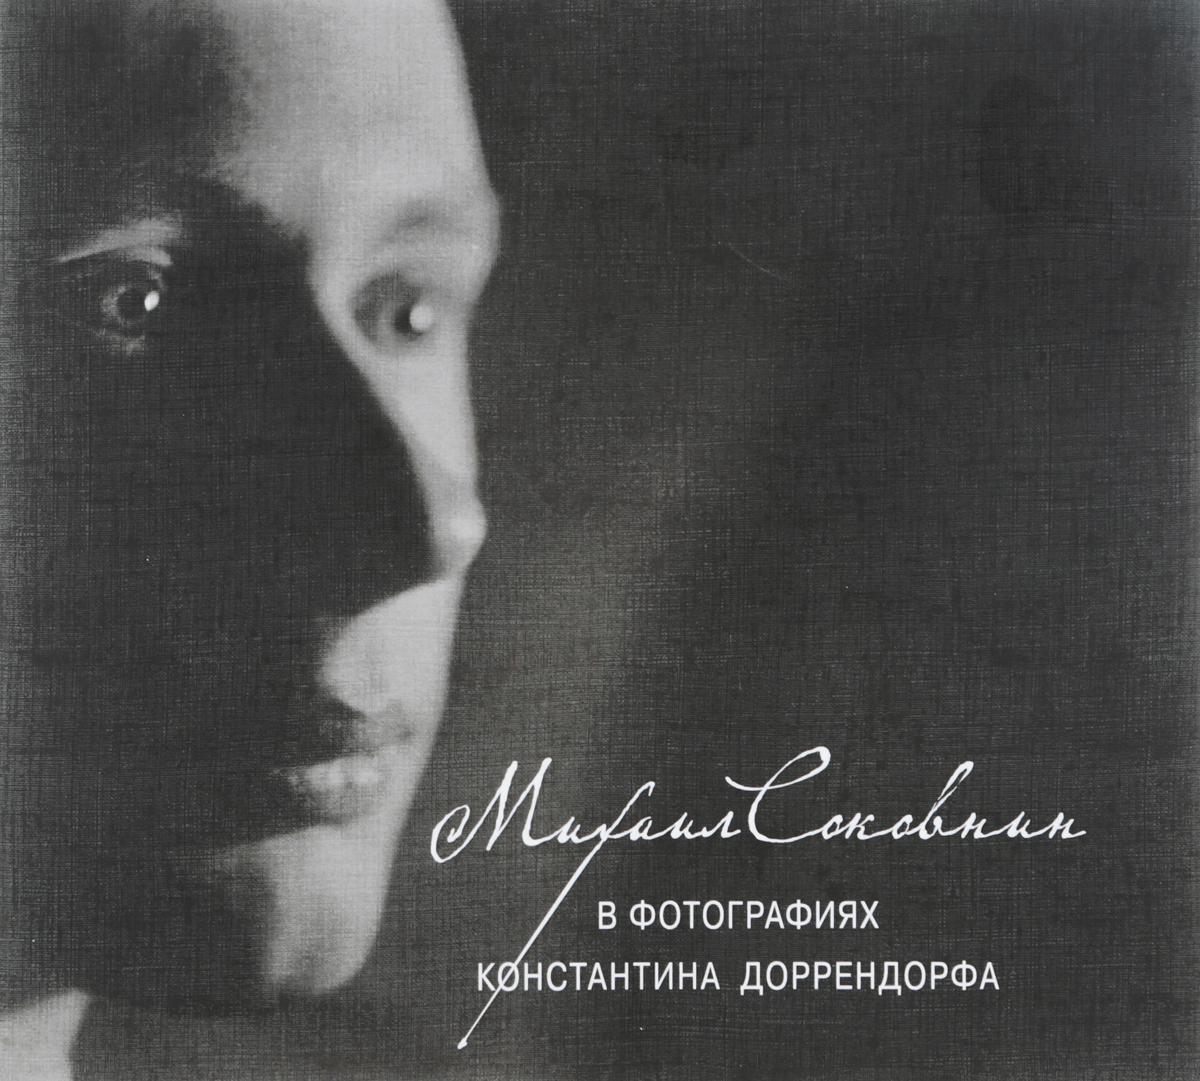 Михаил Соковнин в фотографиях Константина Доррендорфа (+ CD-ROM) михаил соковнин в фотографиях константина доррендорфа cd rom